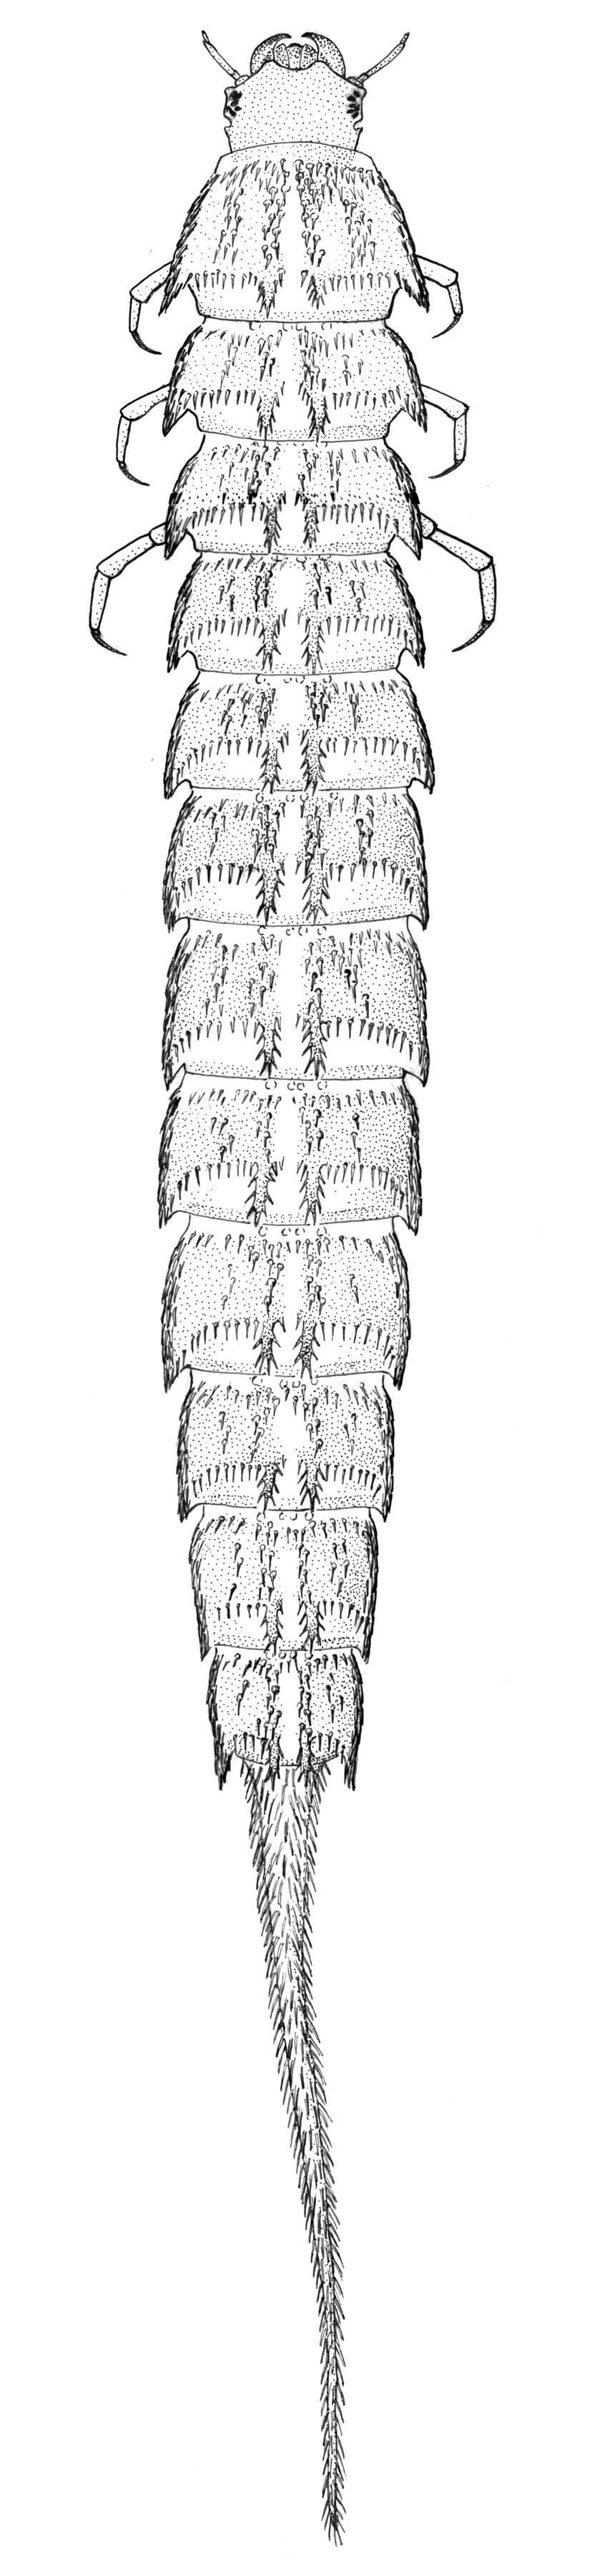 Image of Haliplus